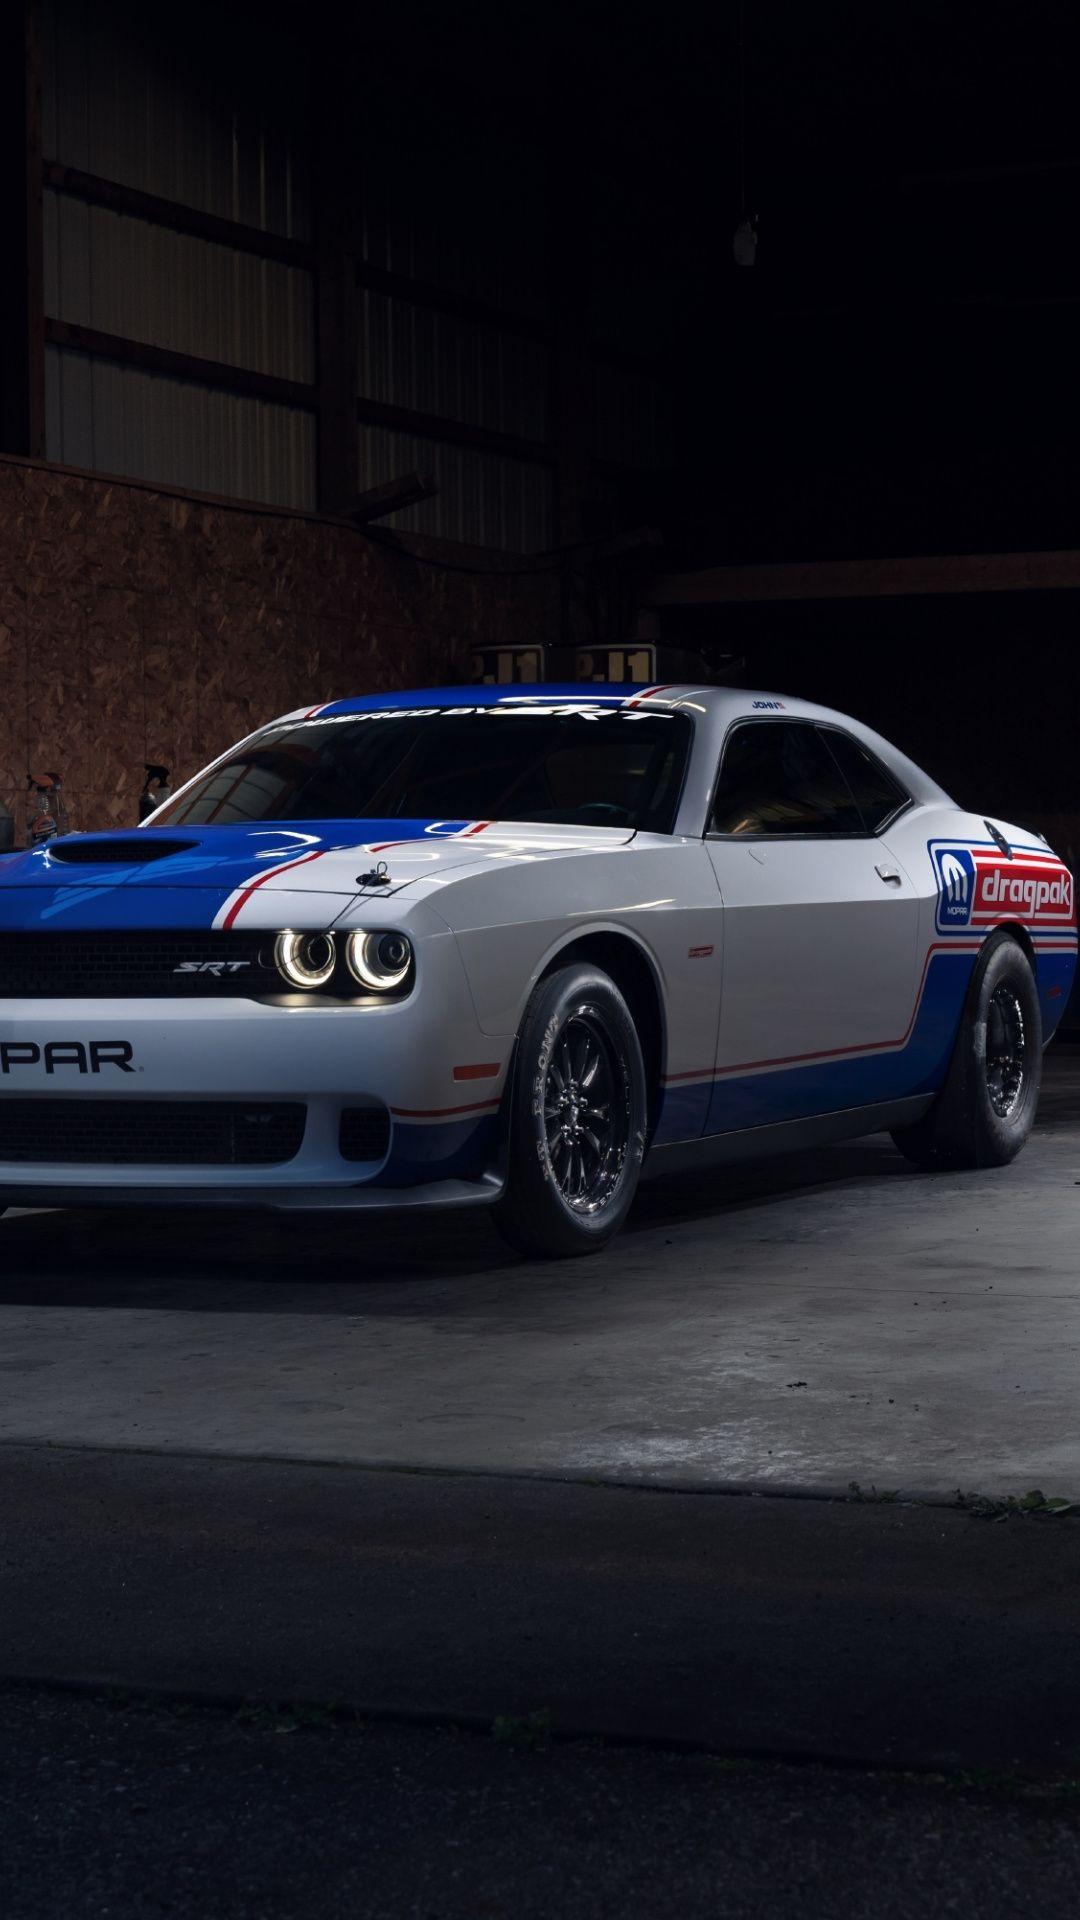 1080x1920 2020 Mopar Dodge Challenger Drag Pak Car Wallpaper